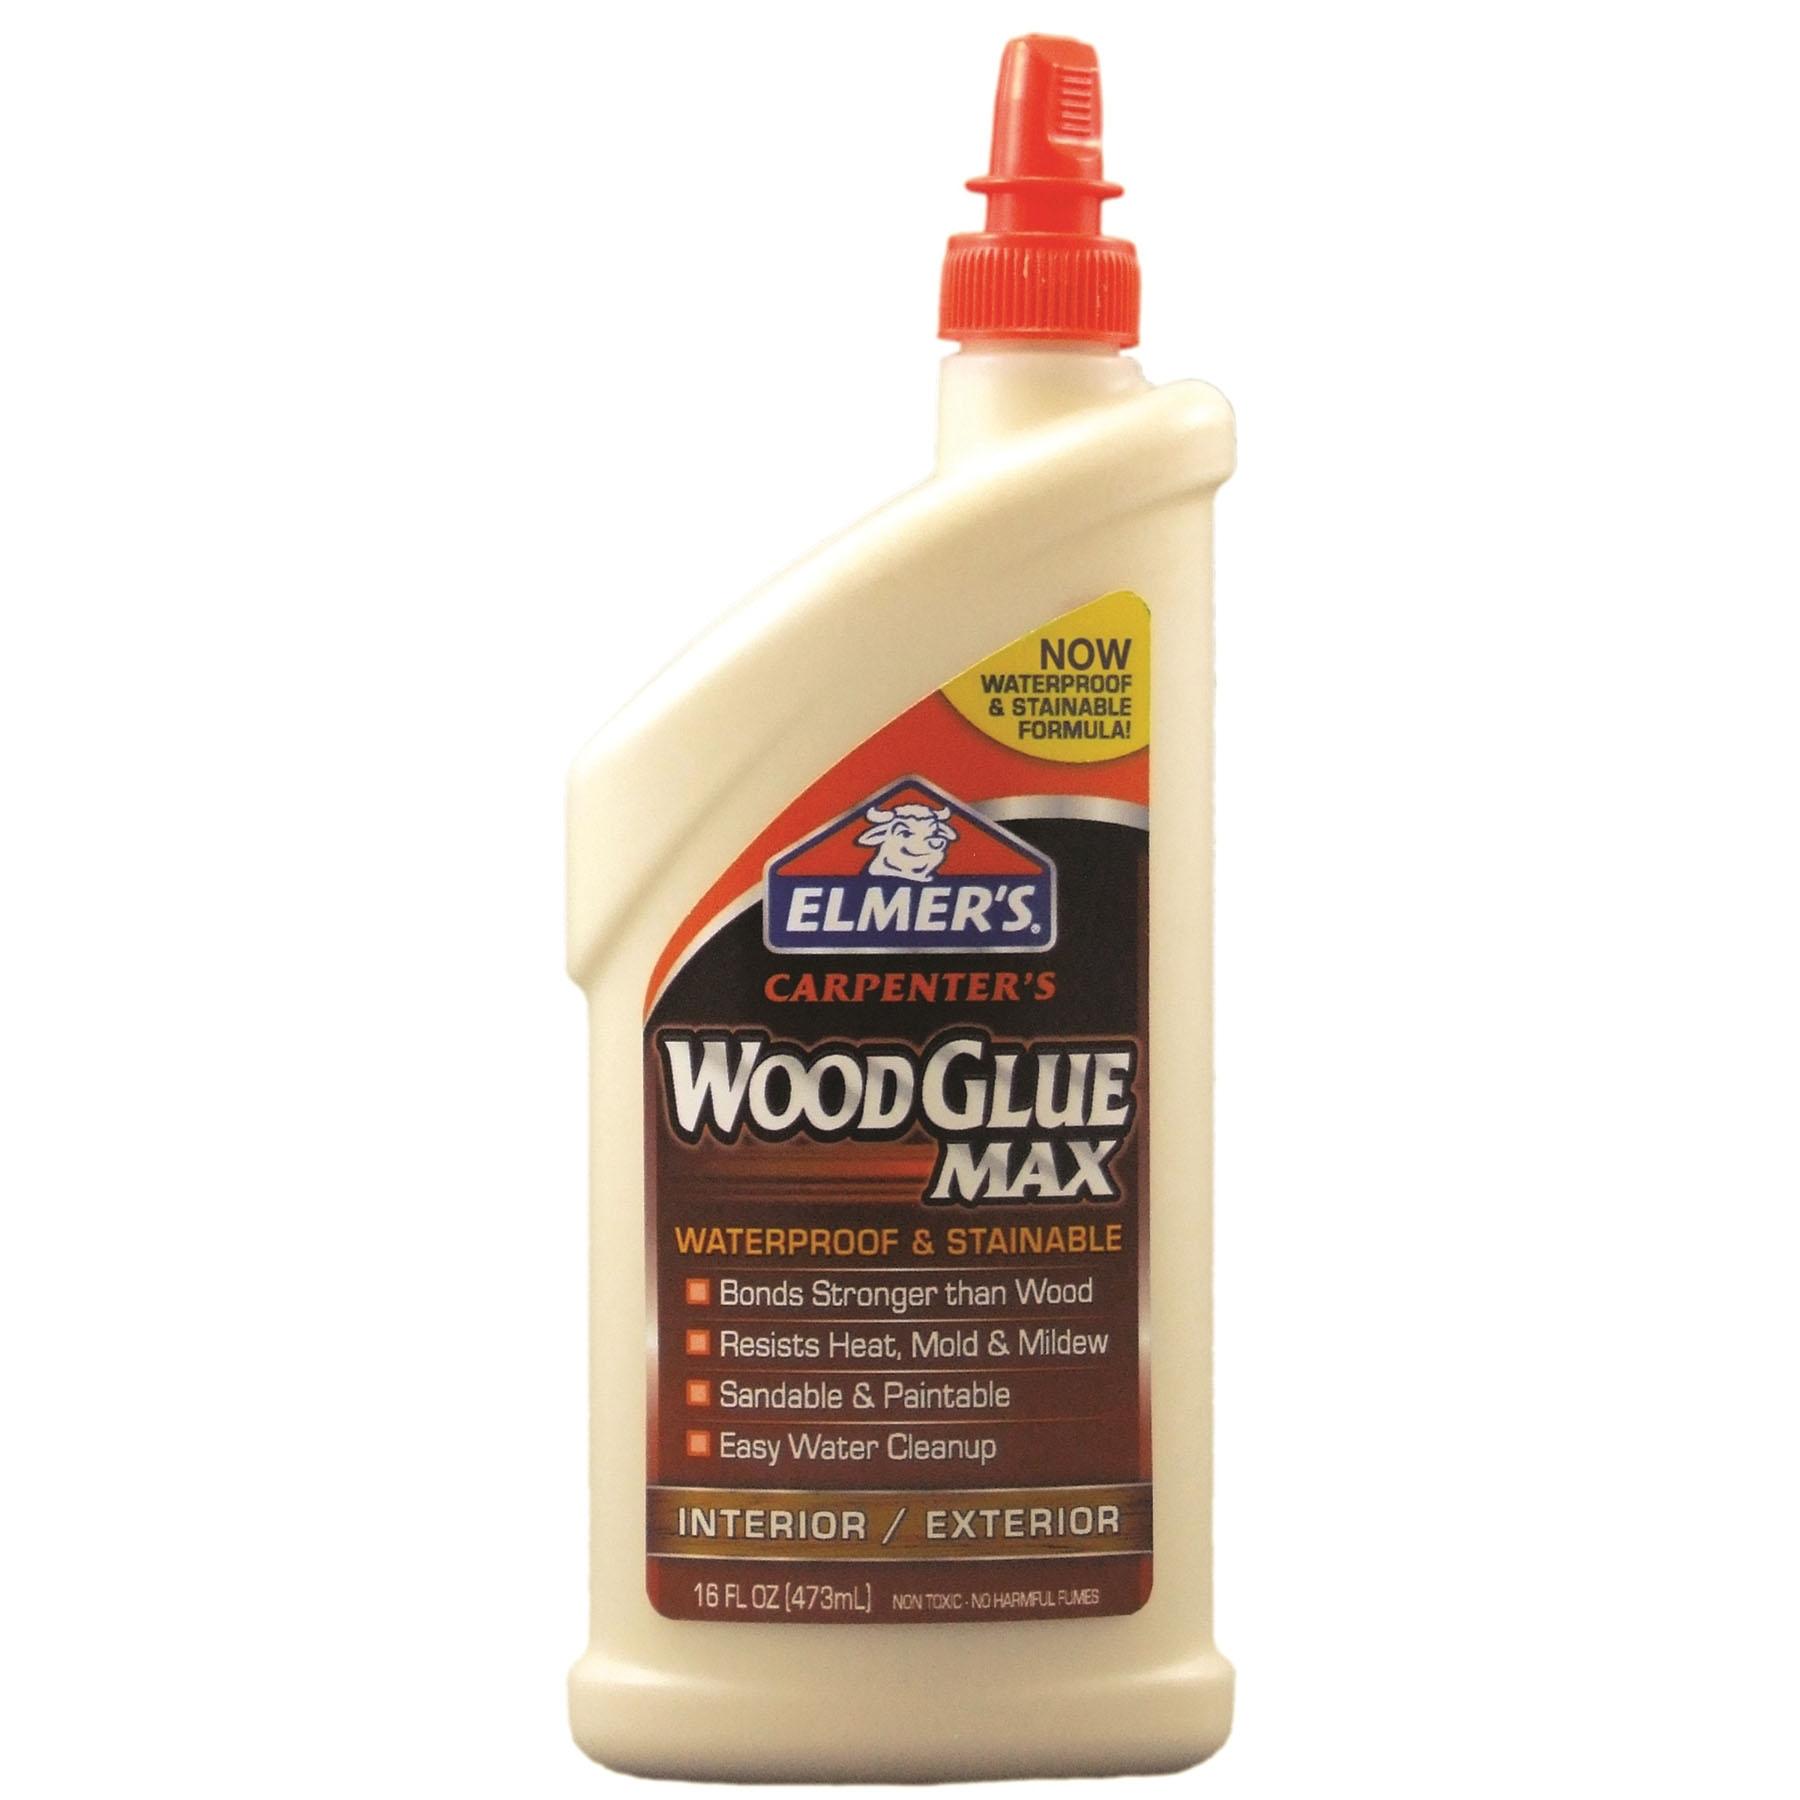 Picture of Elmers Carpenter's Max E7310 Wood Glue, Beige, 16 oz Package, Bottle